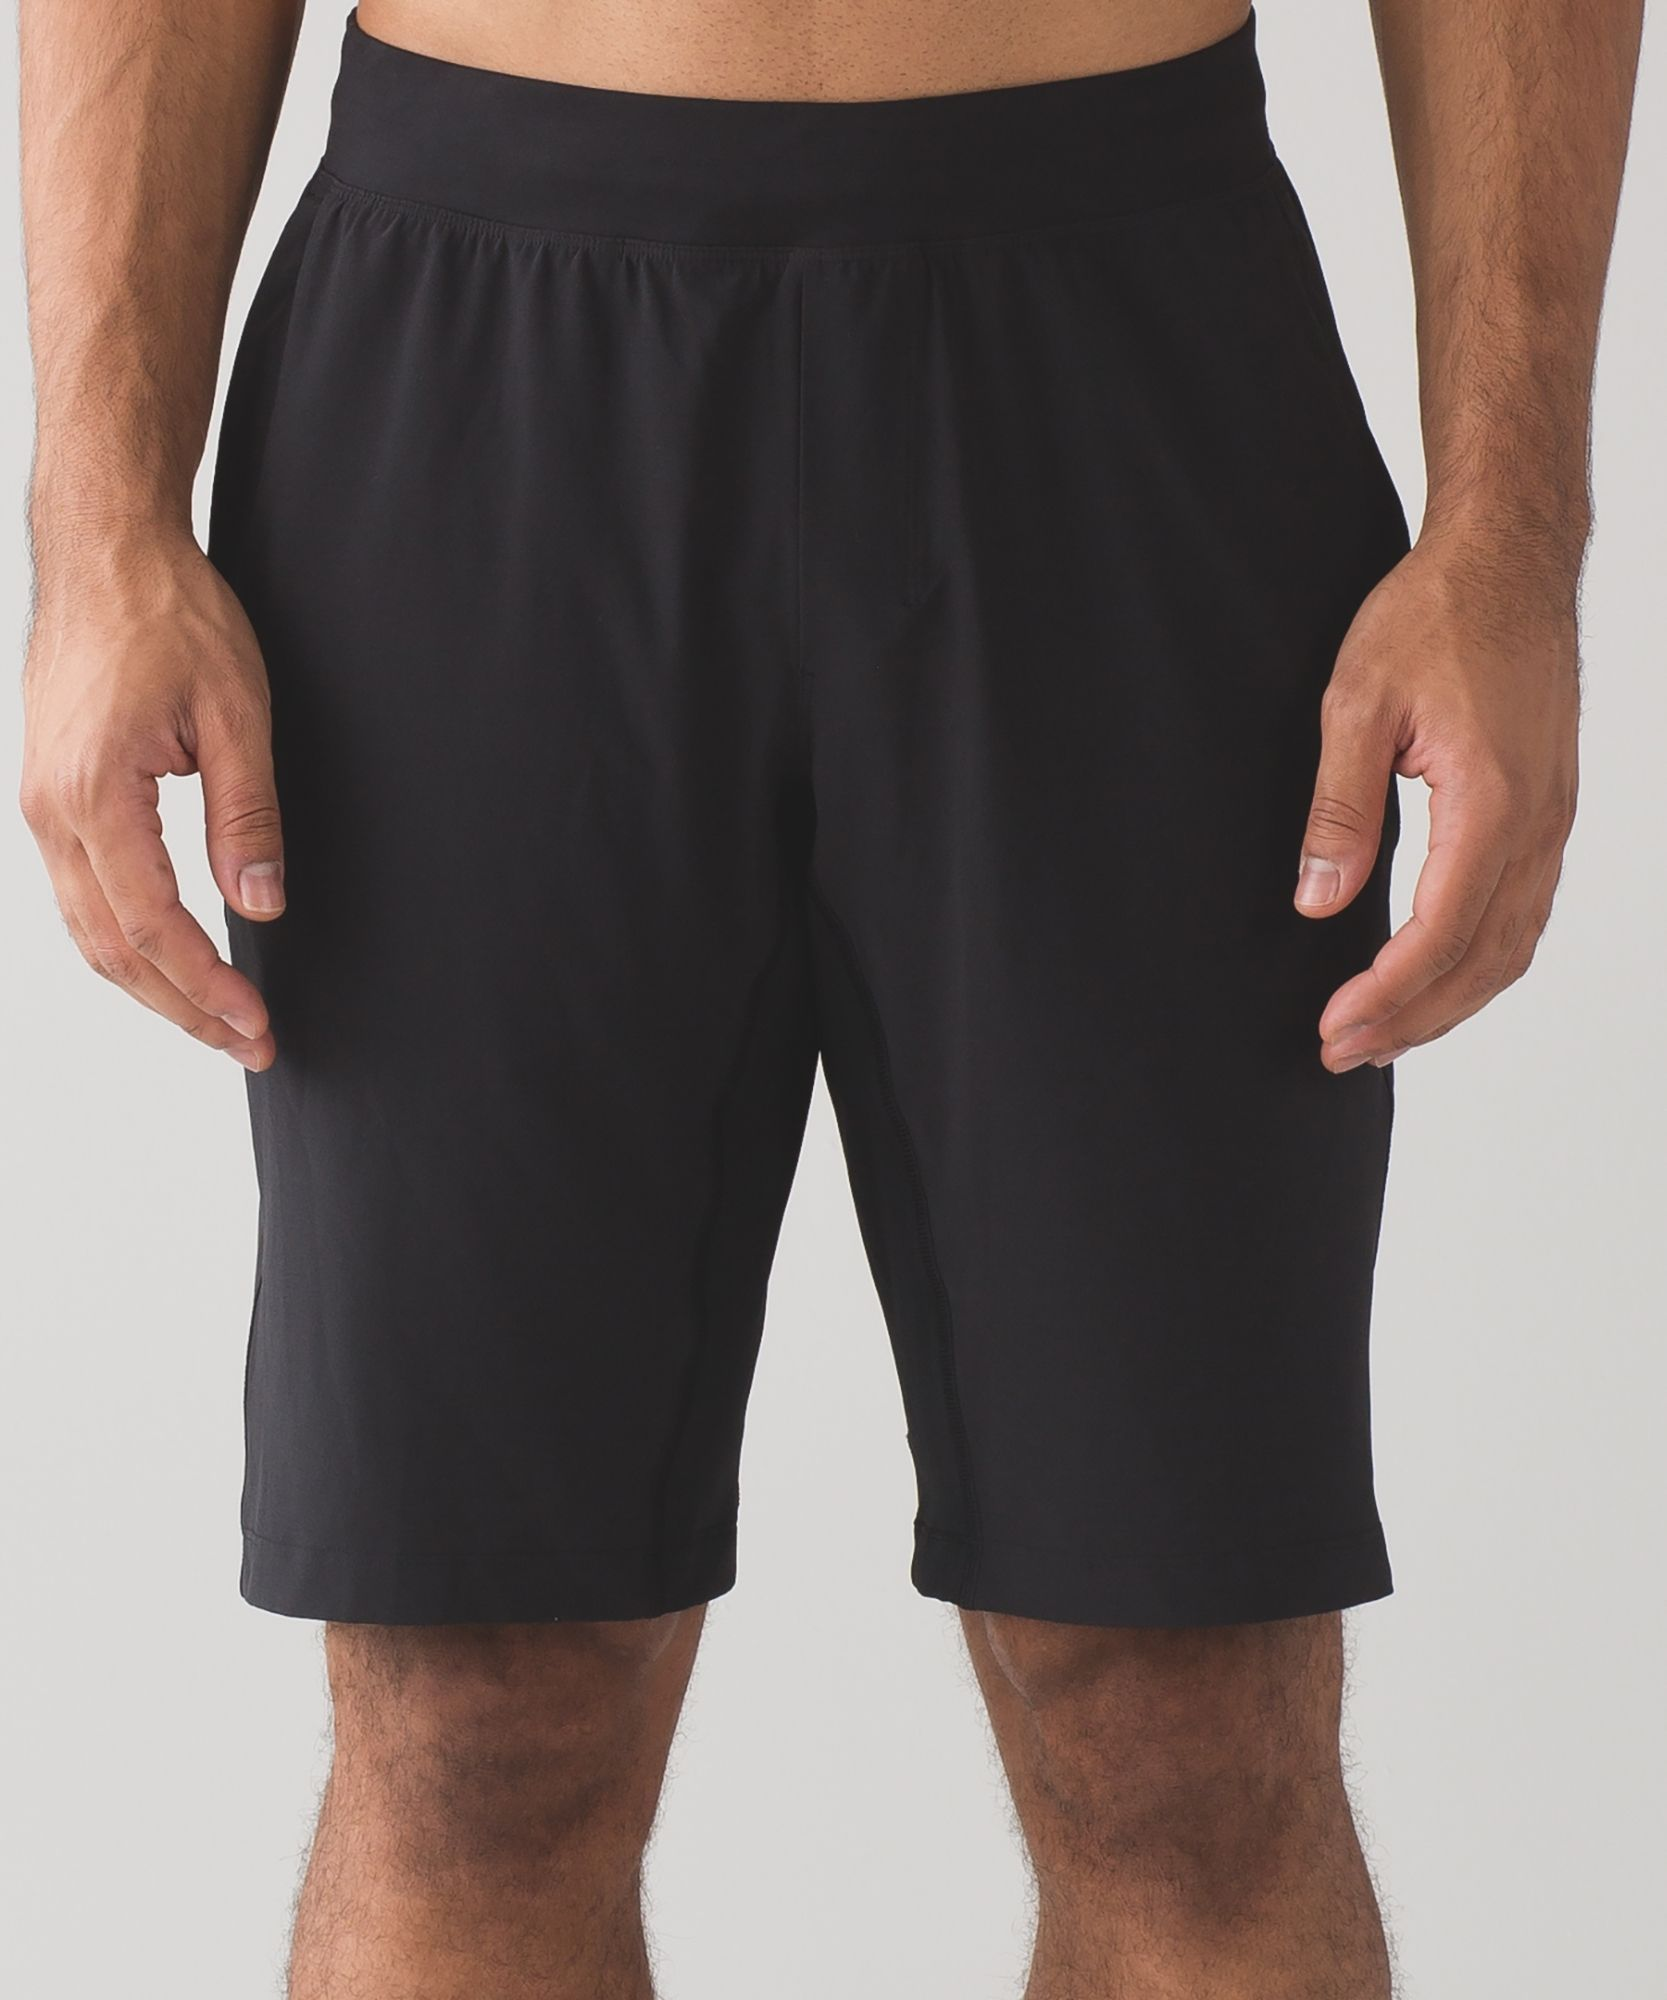 Men's Athletic Shorts - (Black, Size XXL) - T.H.E. Short 9 ...